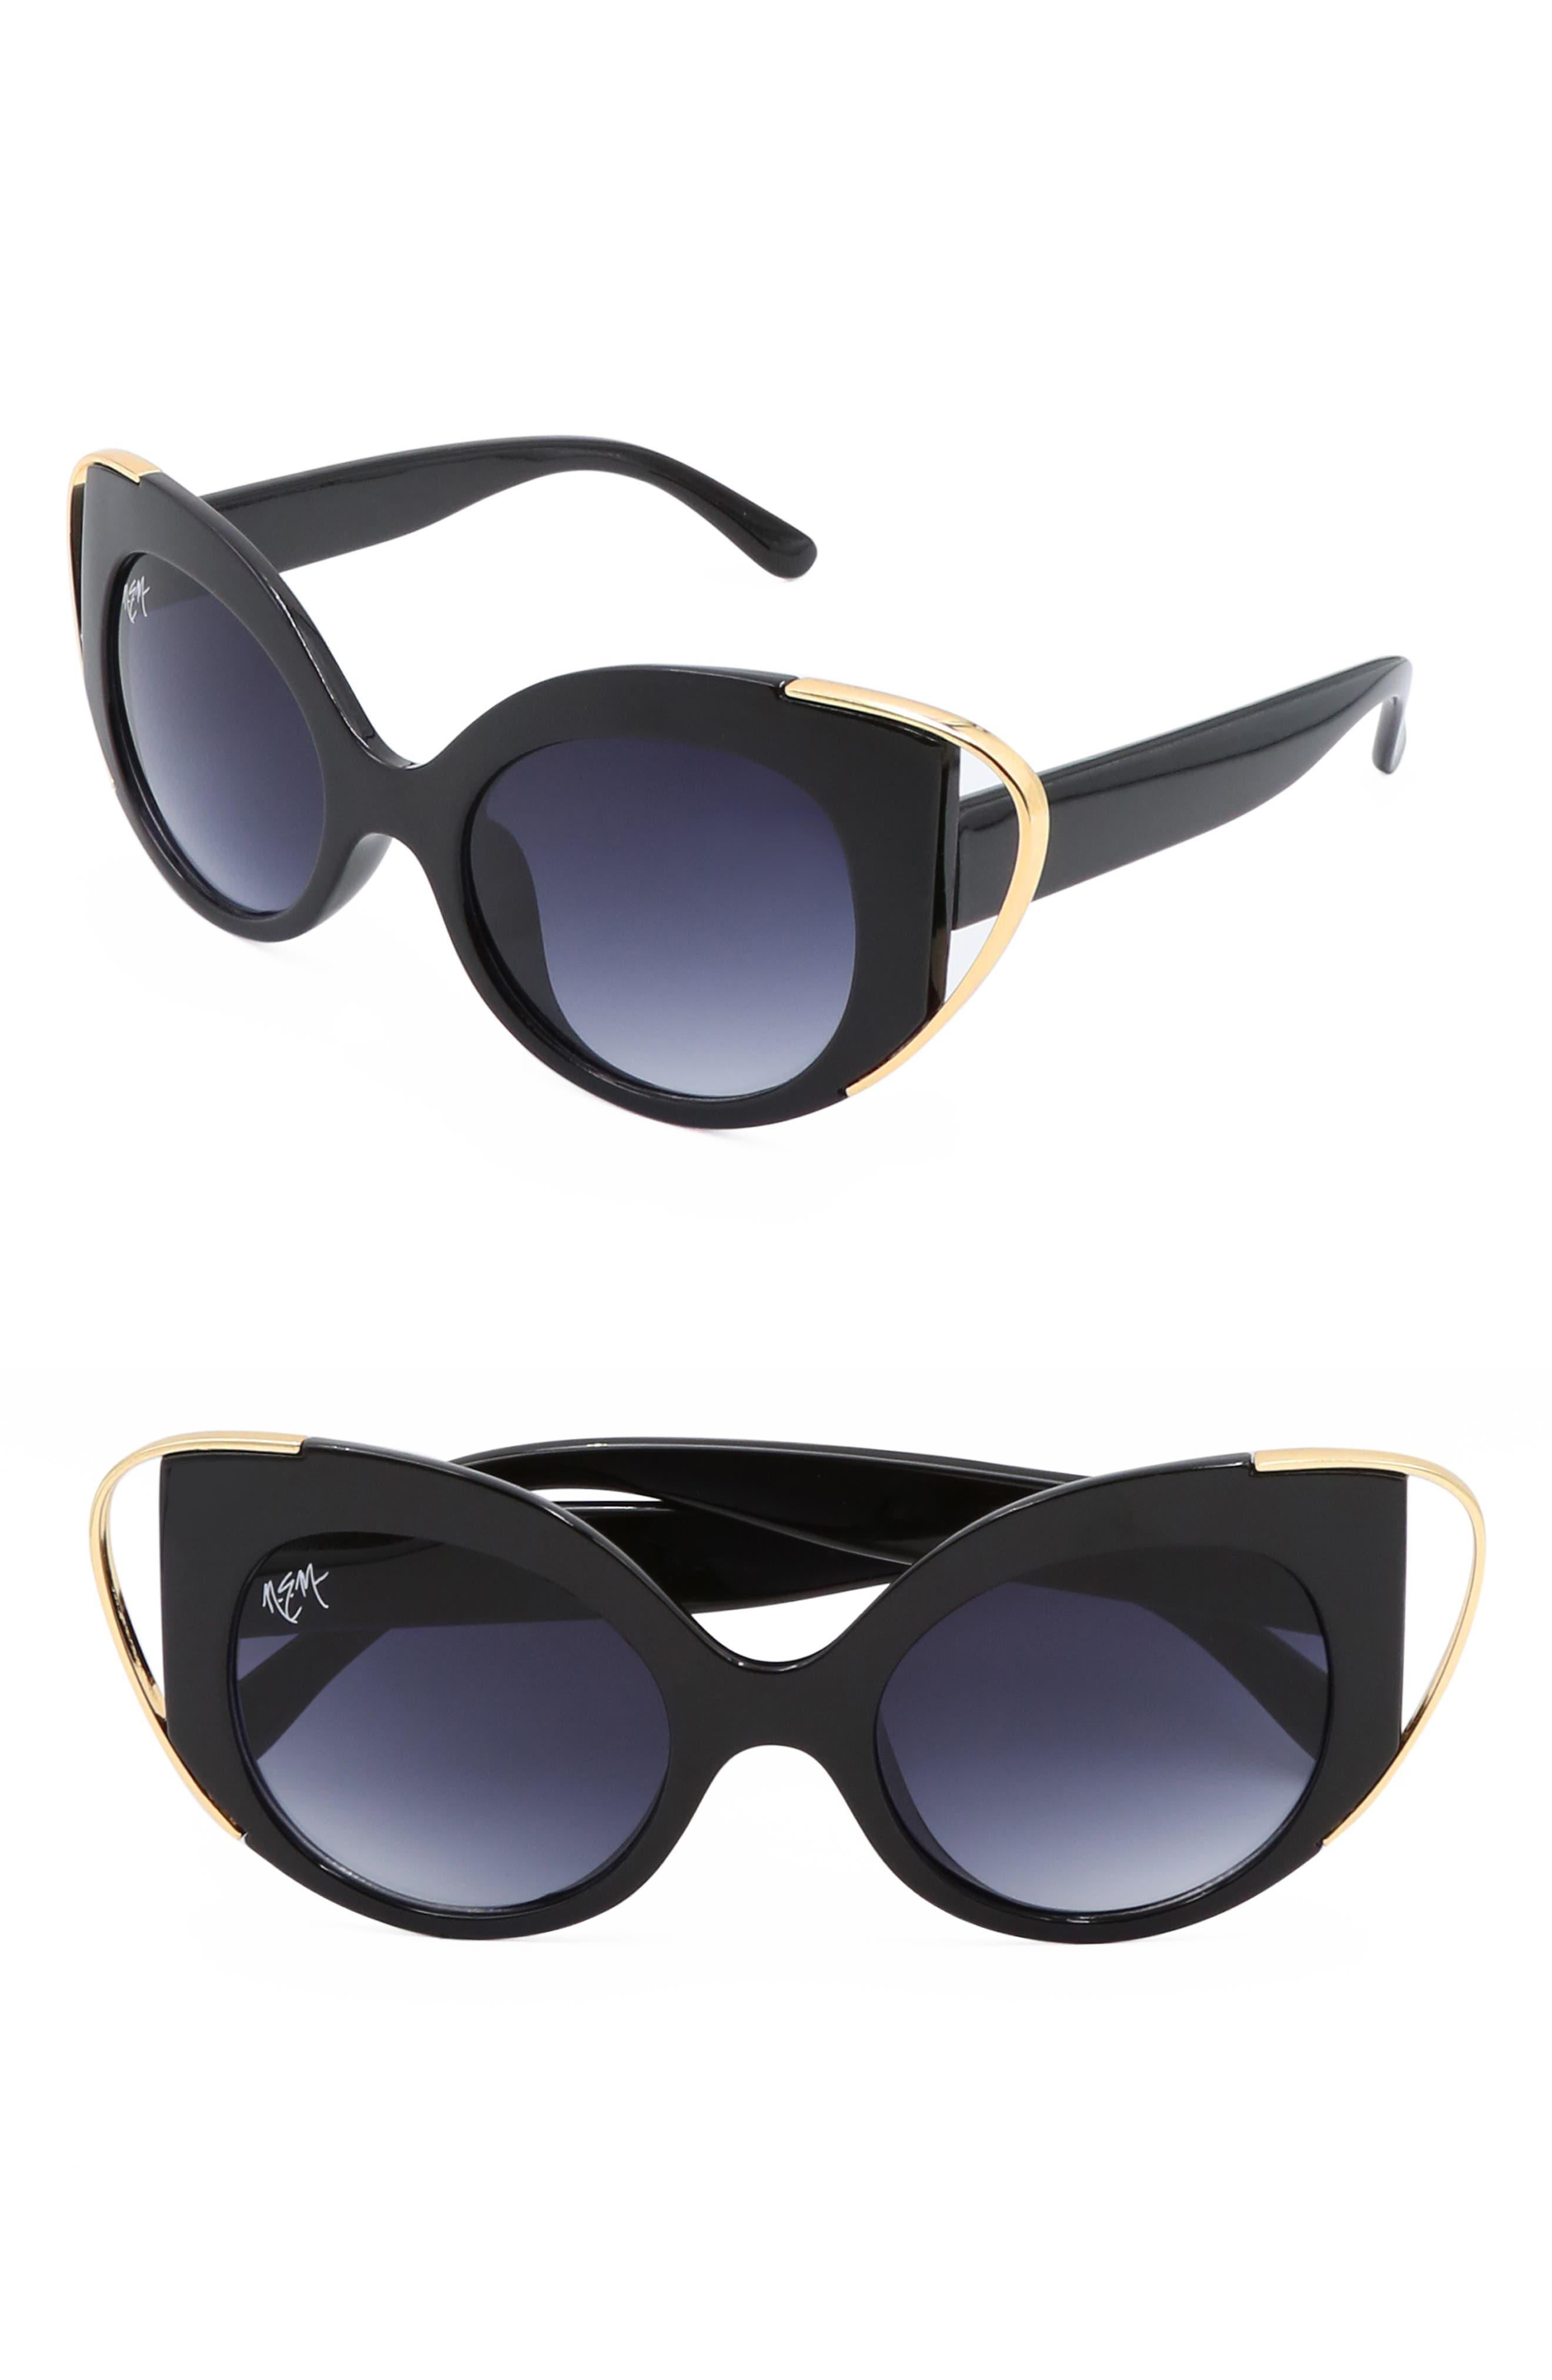 Nem Audrey 50Mm Cutout Cat Eye Sunglasses - Black W Dark Lens